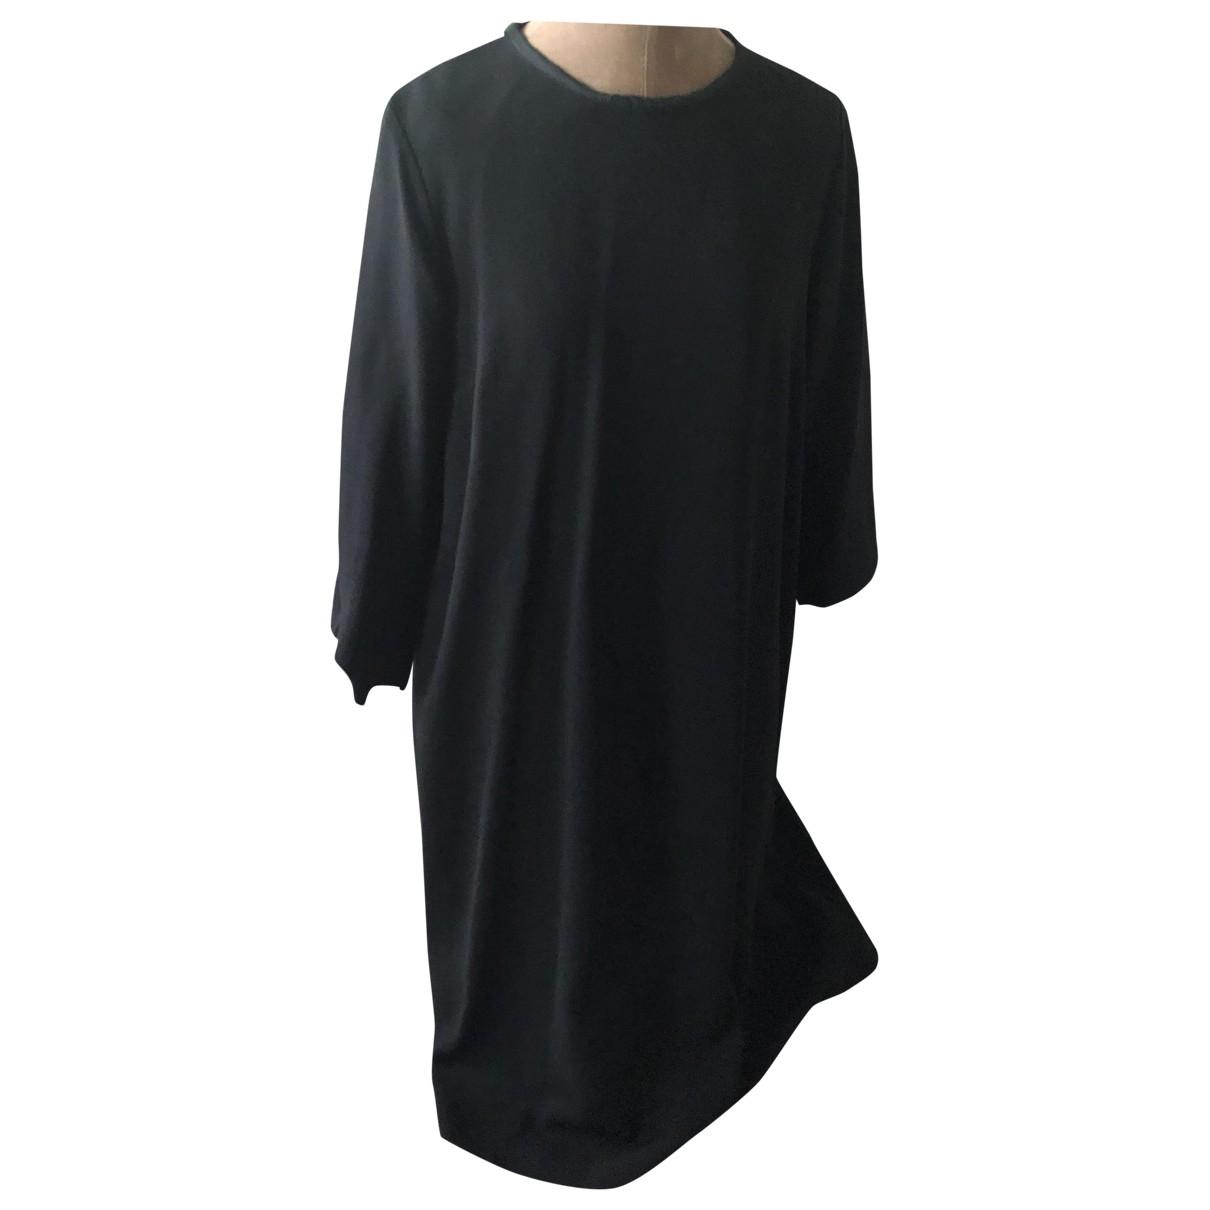 Max Mara Studio \N Black dress for Women 44 IT